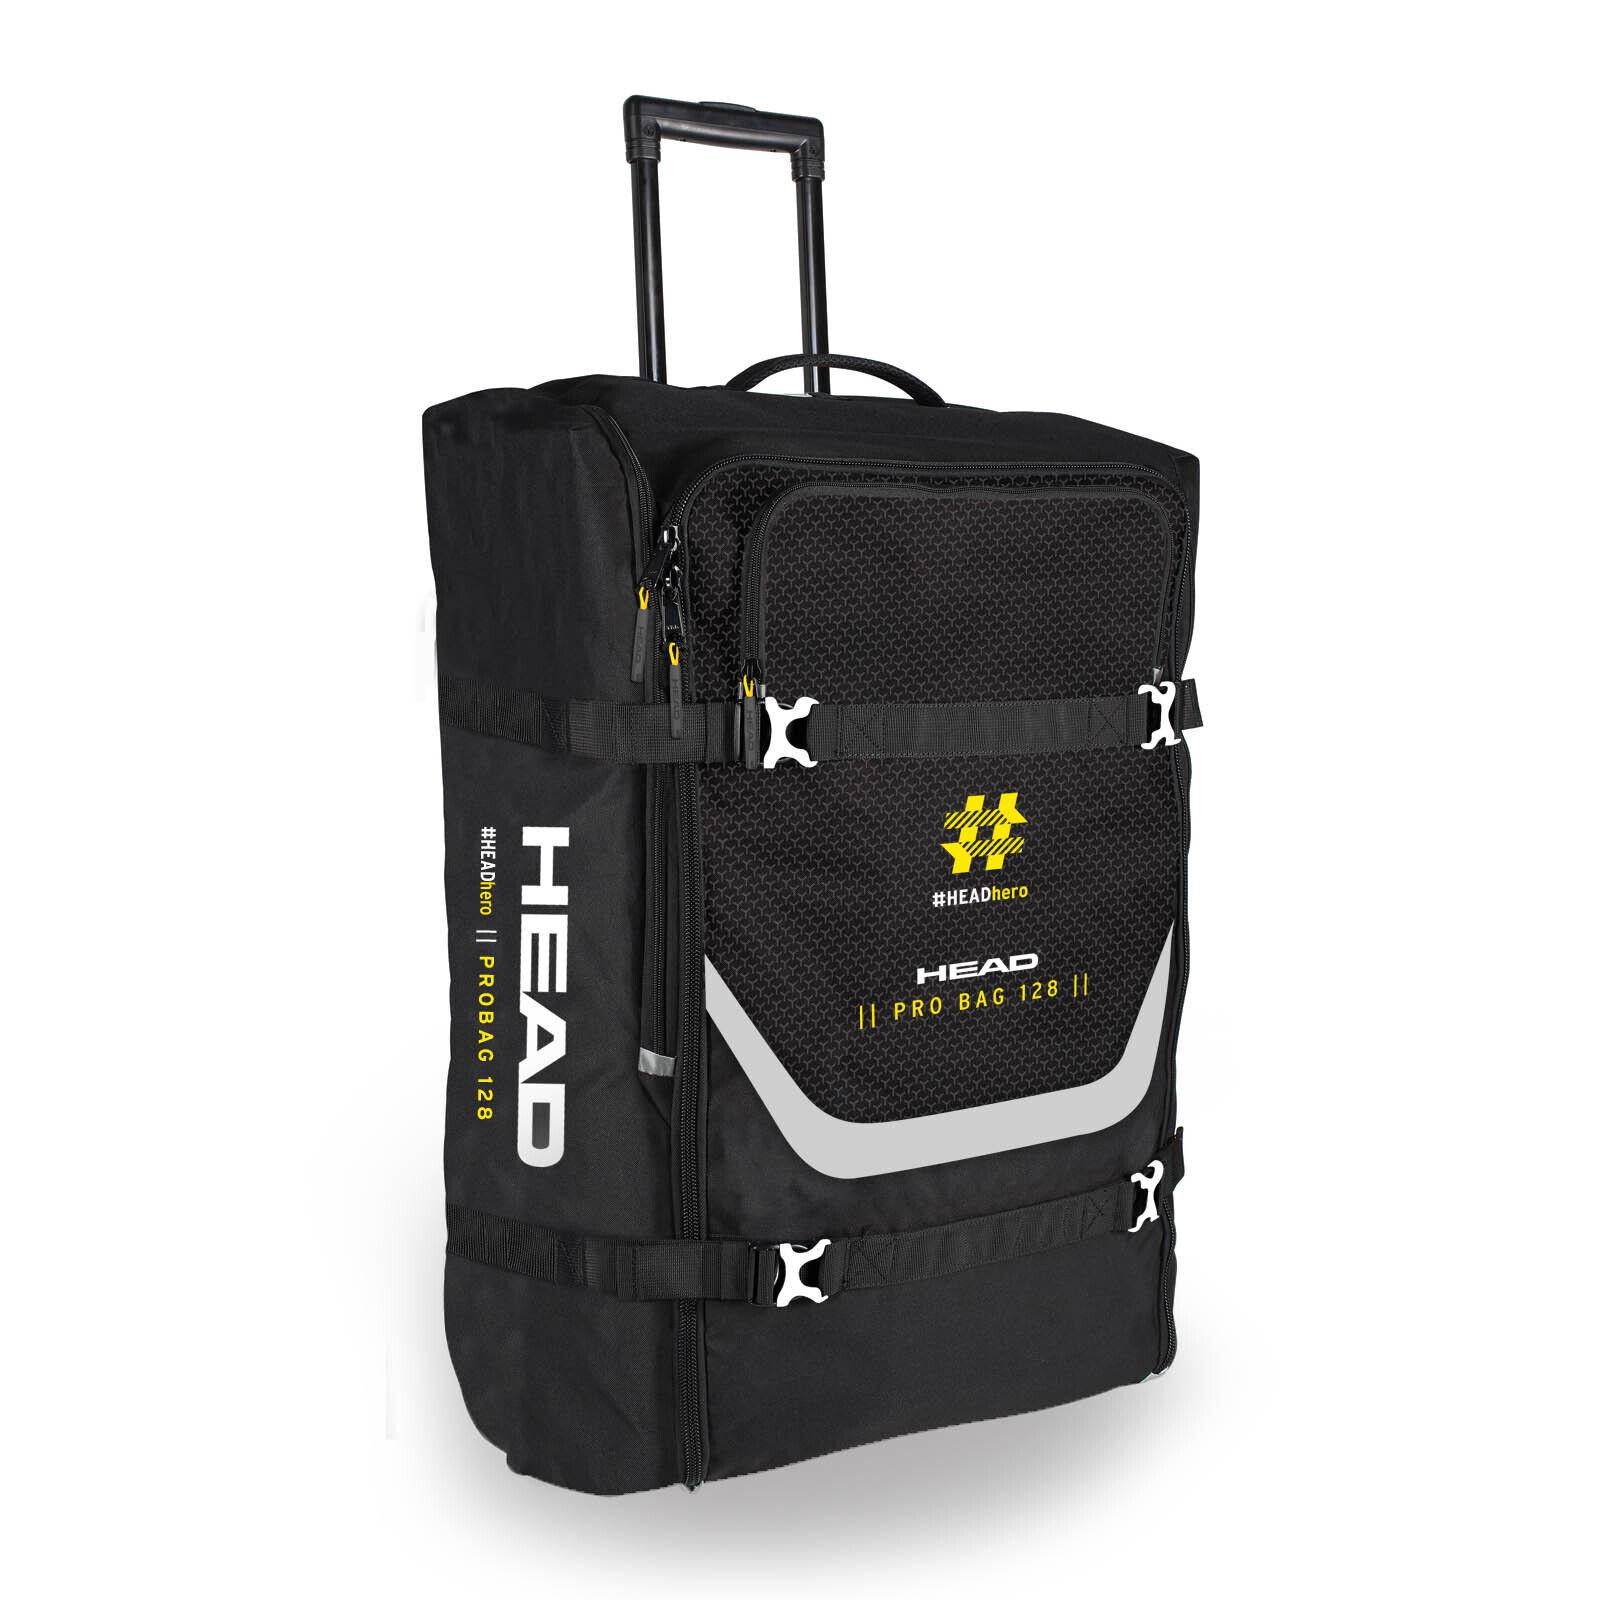 Head Hero Pro 128 Travel Reisekoffer 128 Liter Volumen